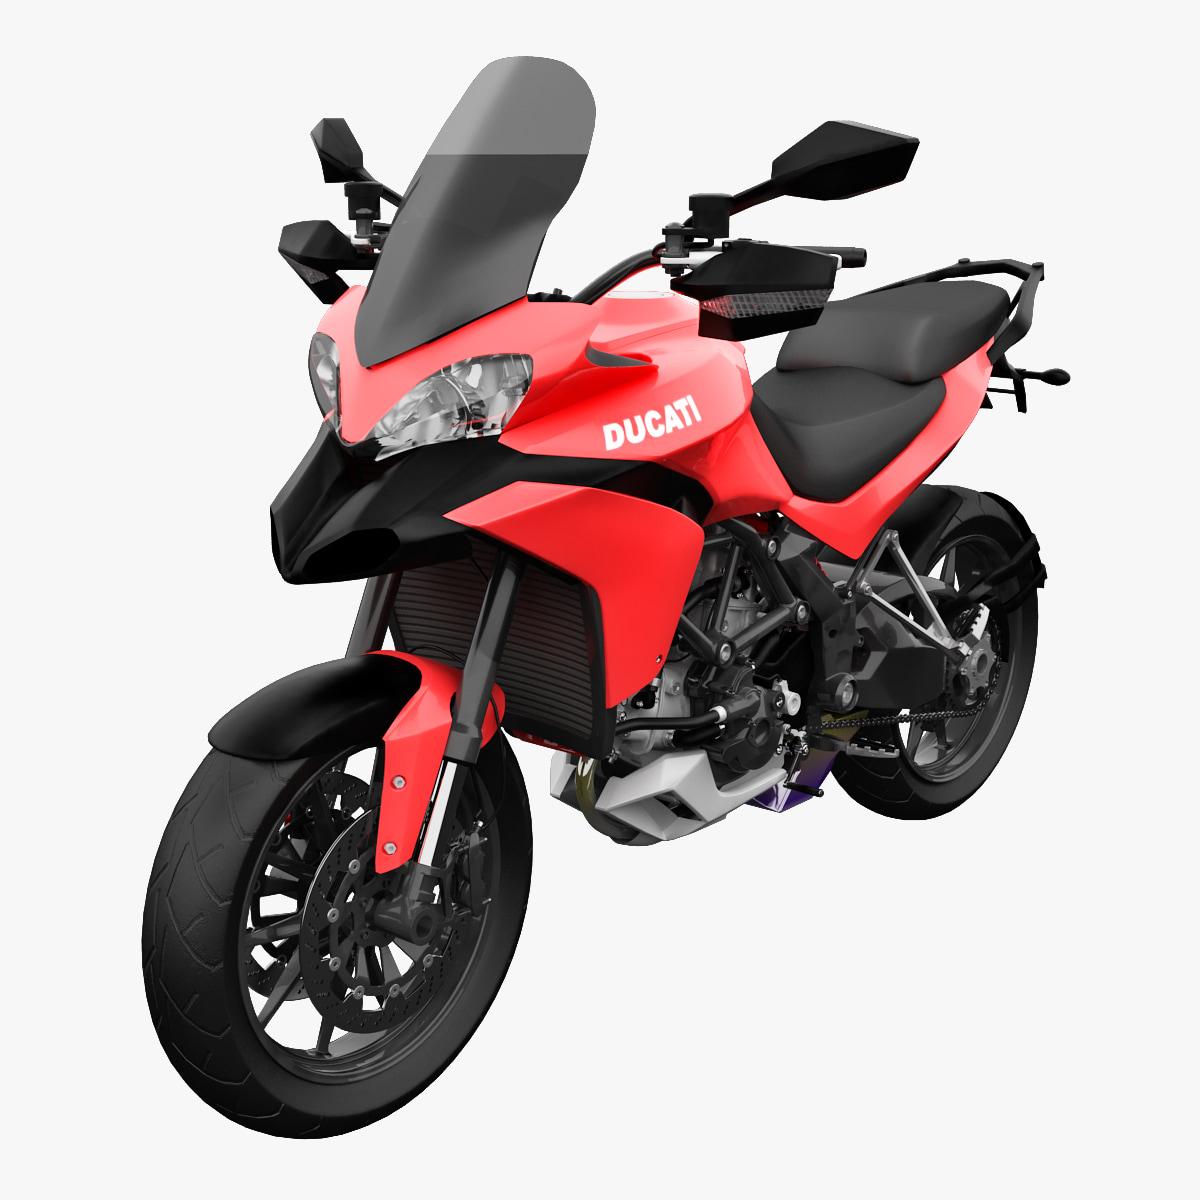 Ducati_Multistrada_1200s_00.jpg